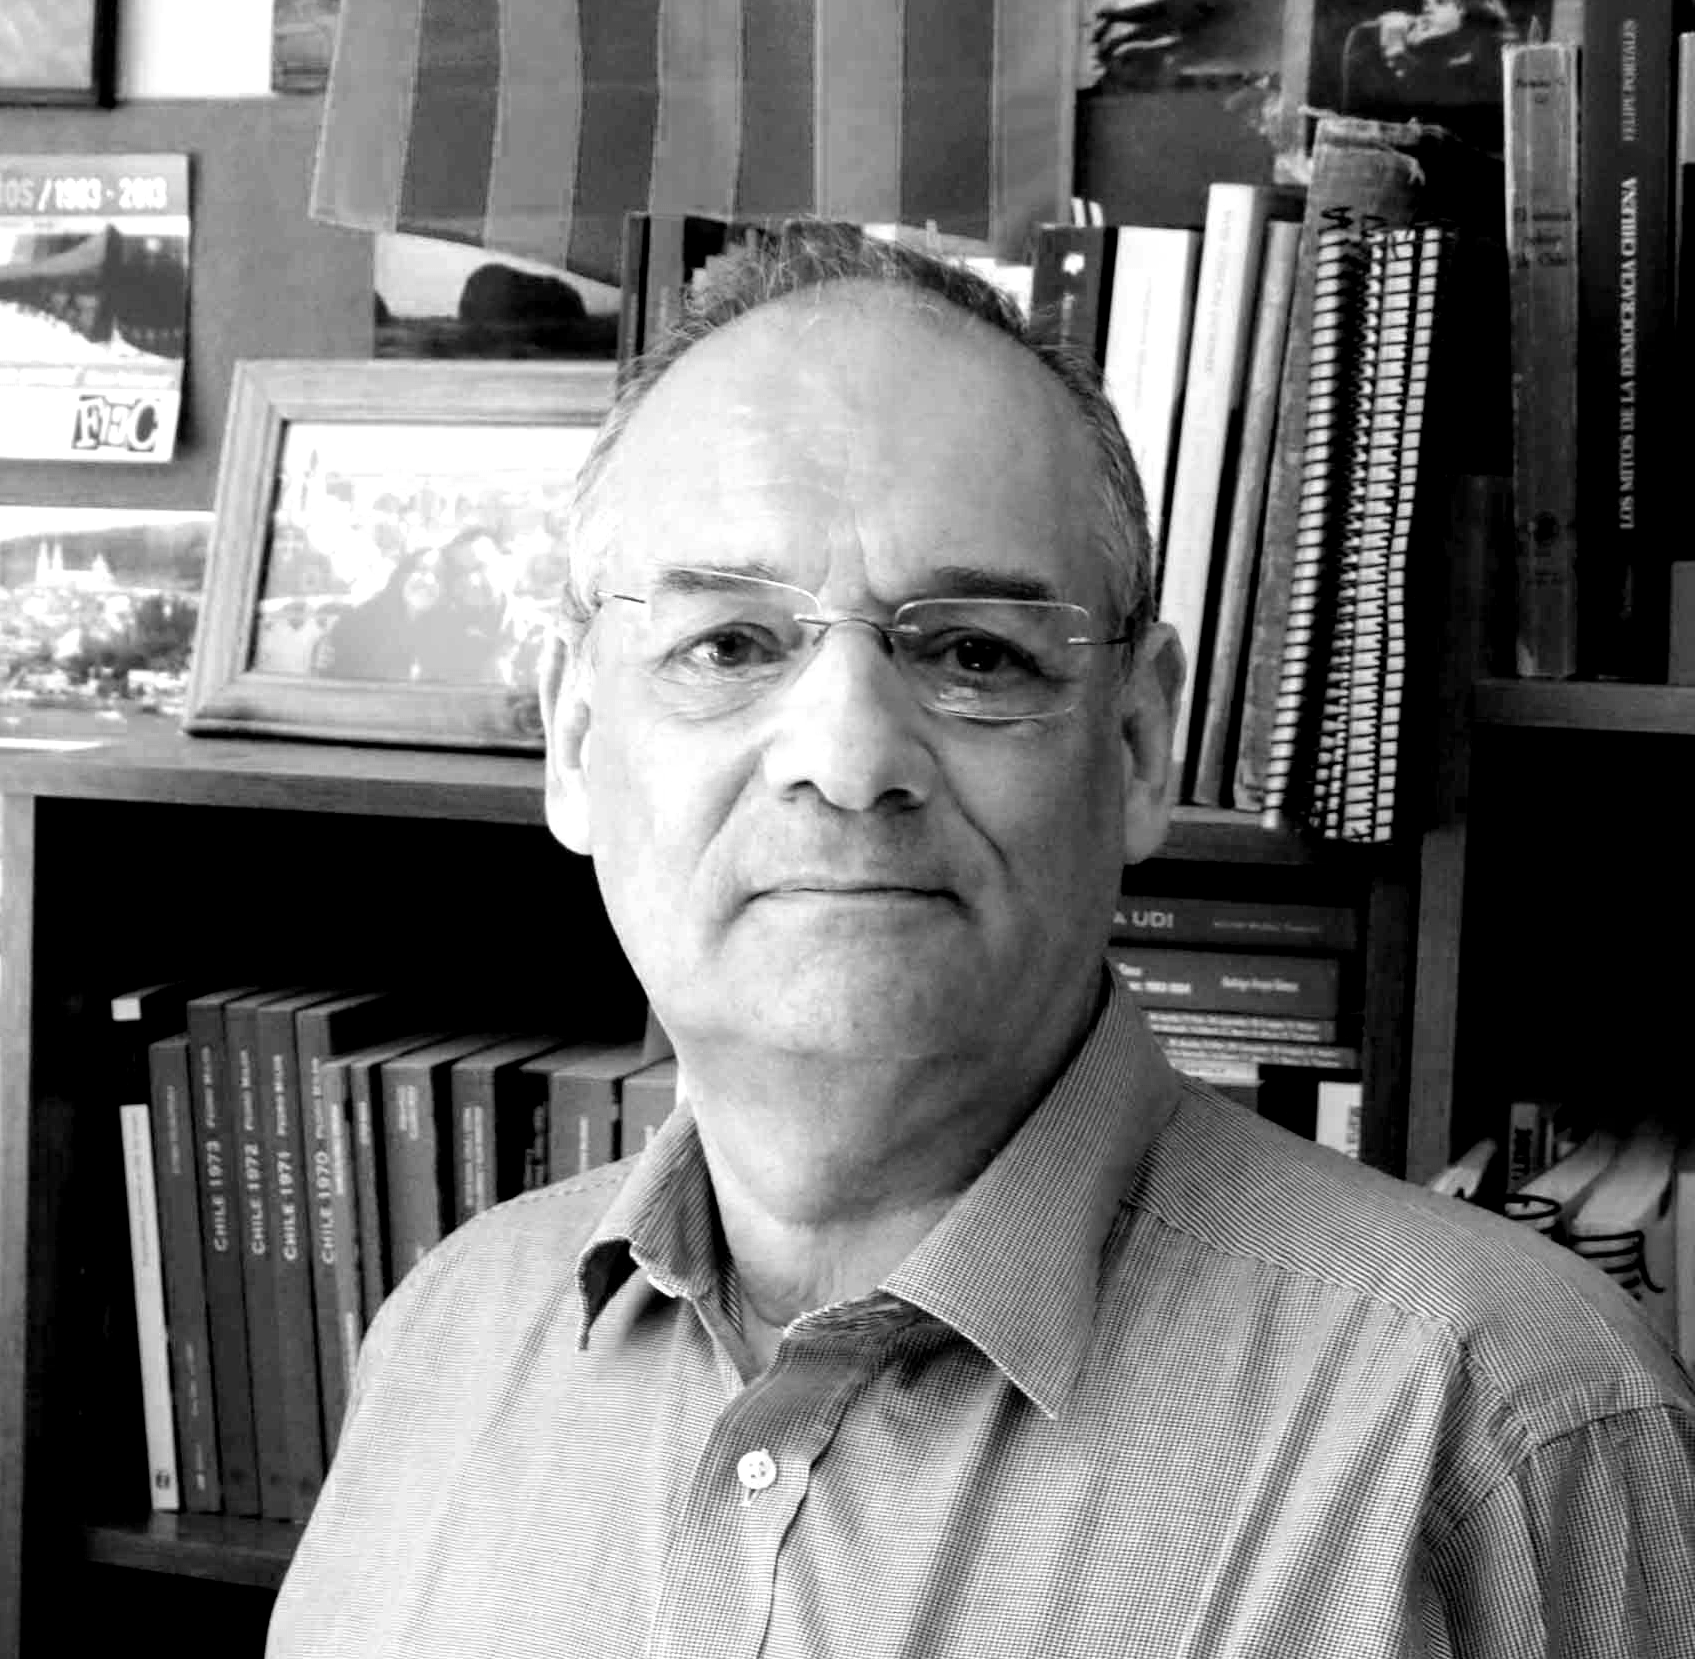 Jorge Magasich